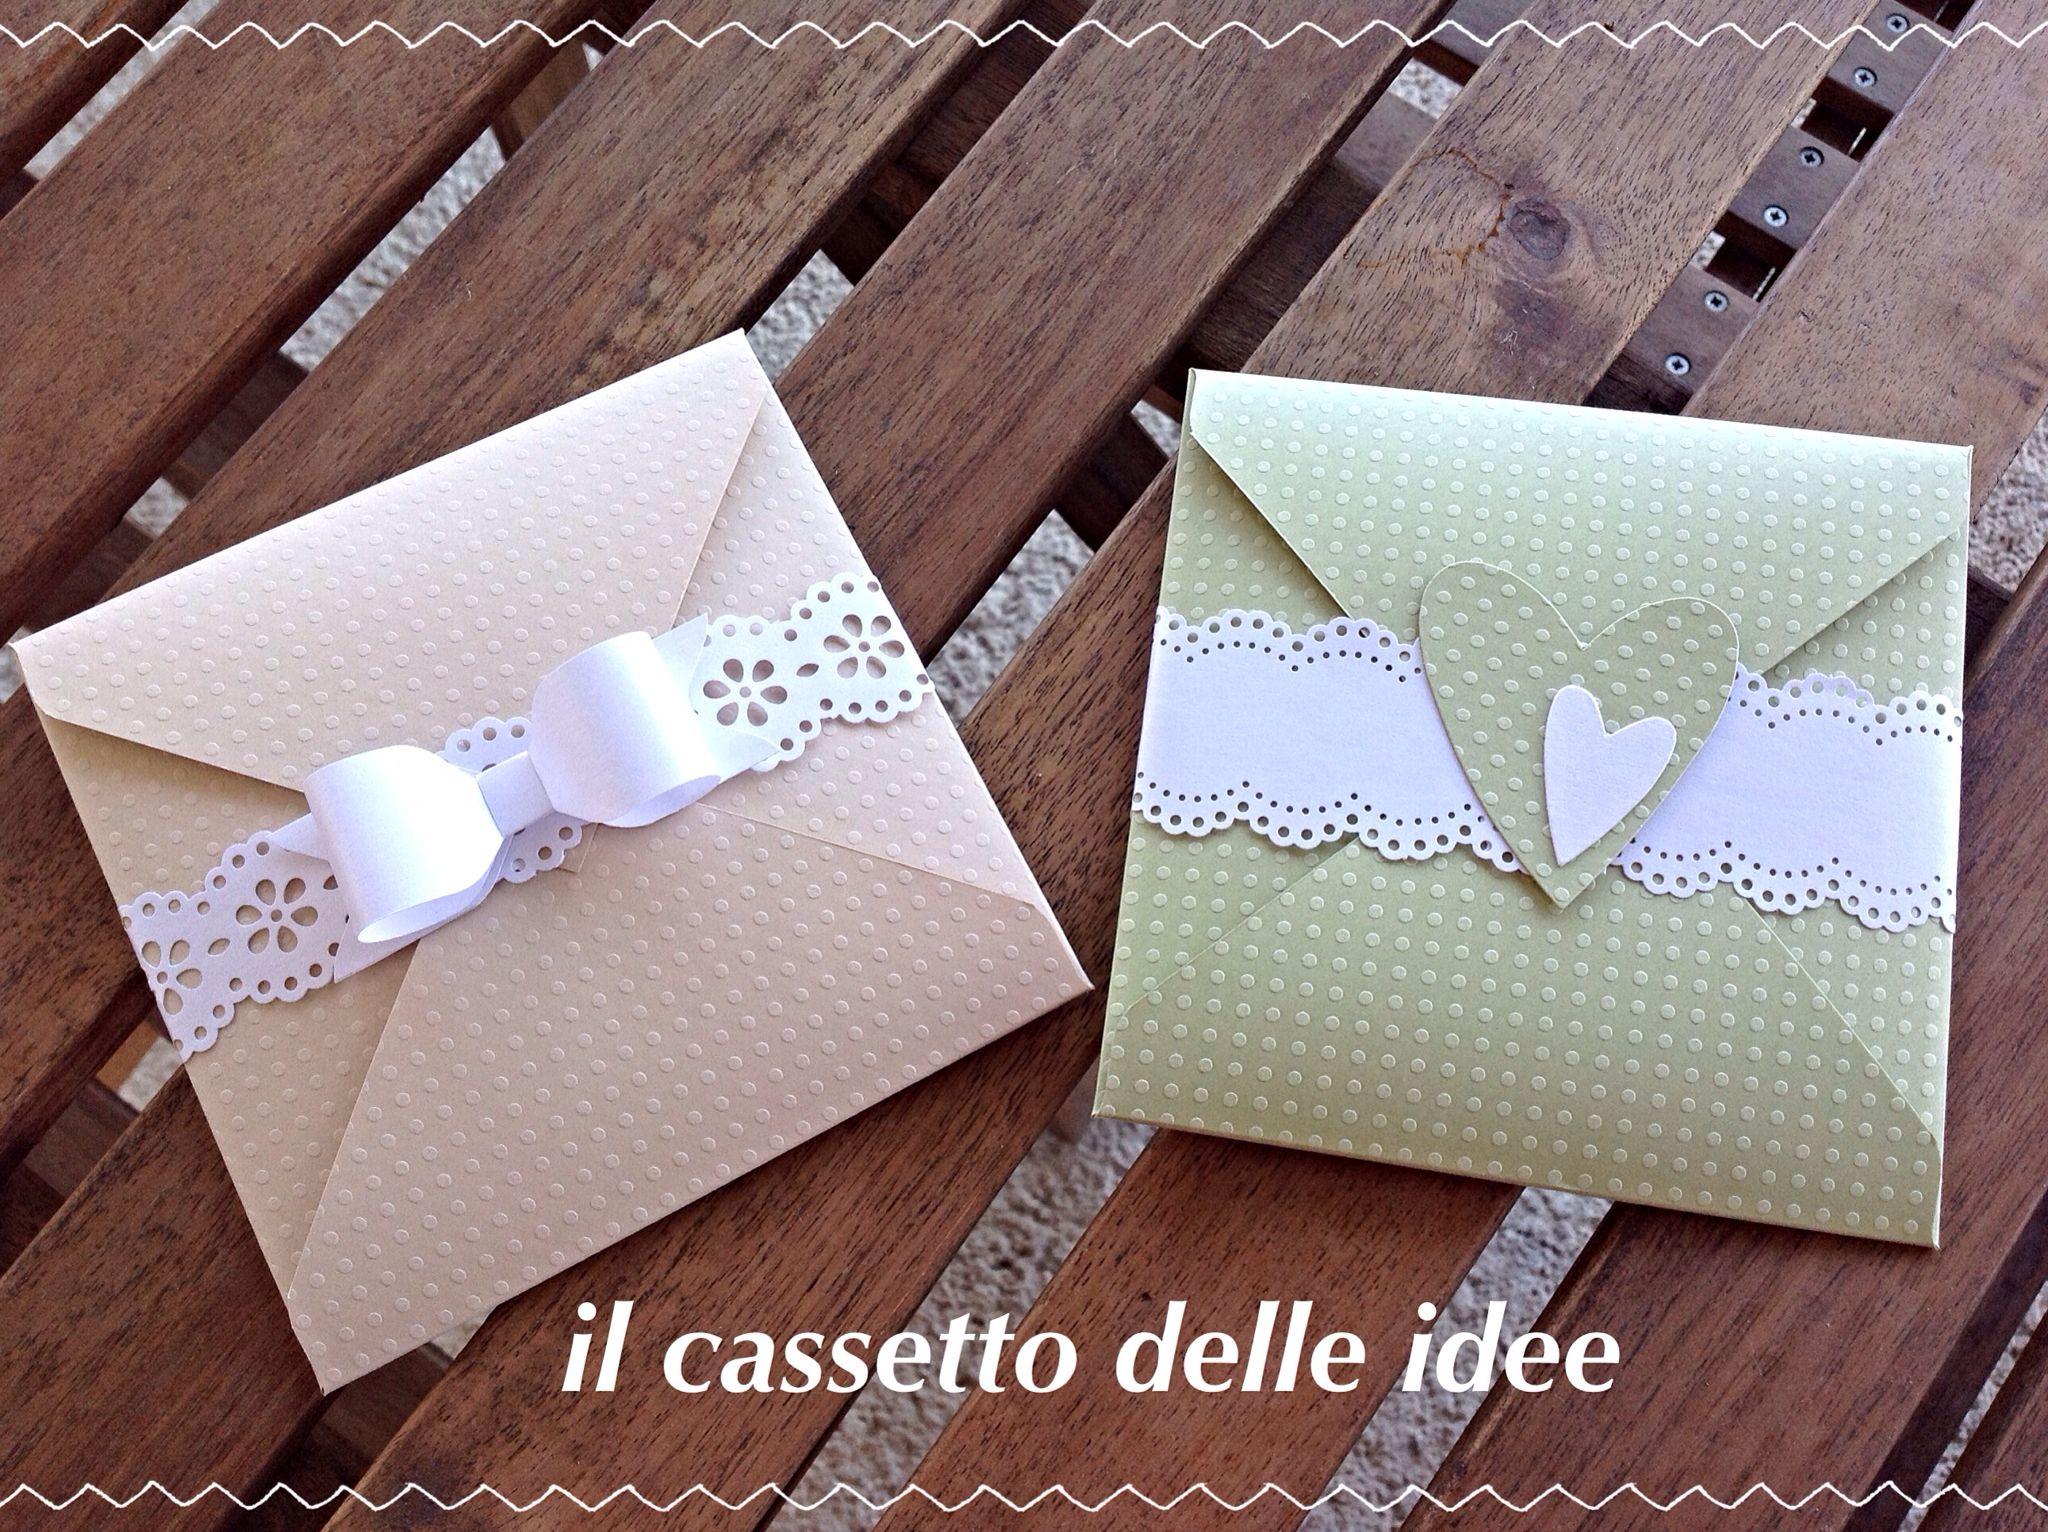 Matrimonio Regalo In Busta : Scatola porta buste regalo soldi matrimonio wedding card box sposi